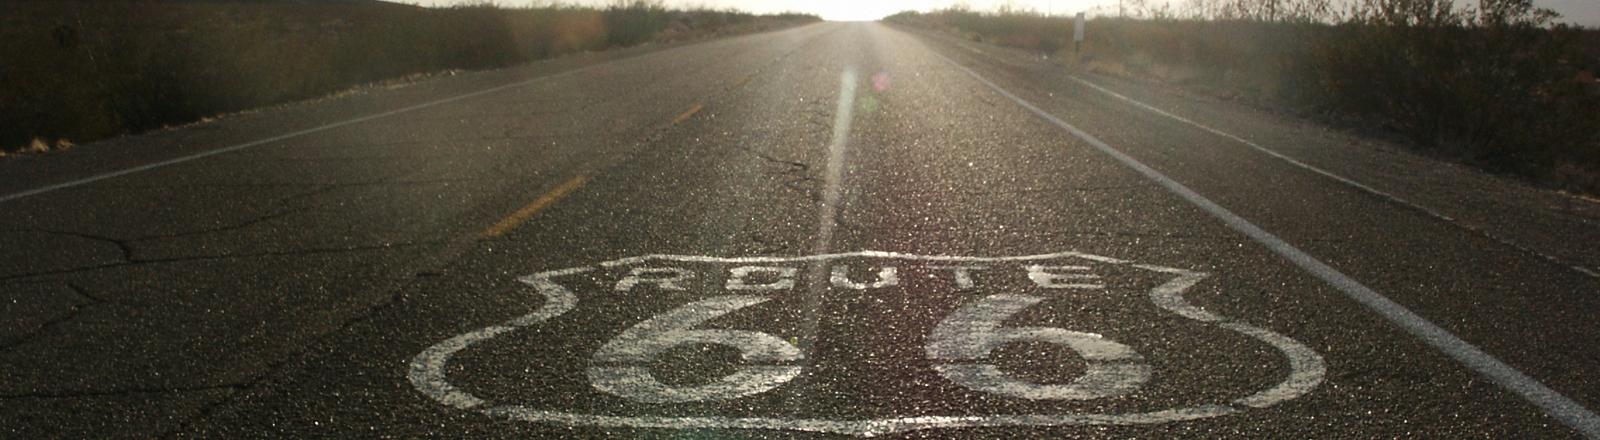 Die berühmte Route 66 verlor am 27. Juni 1985 ihren Highway-Status.